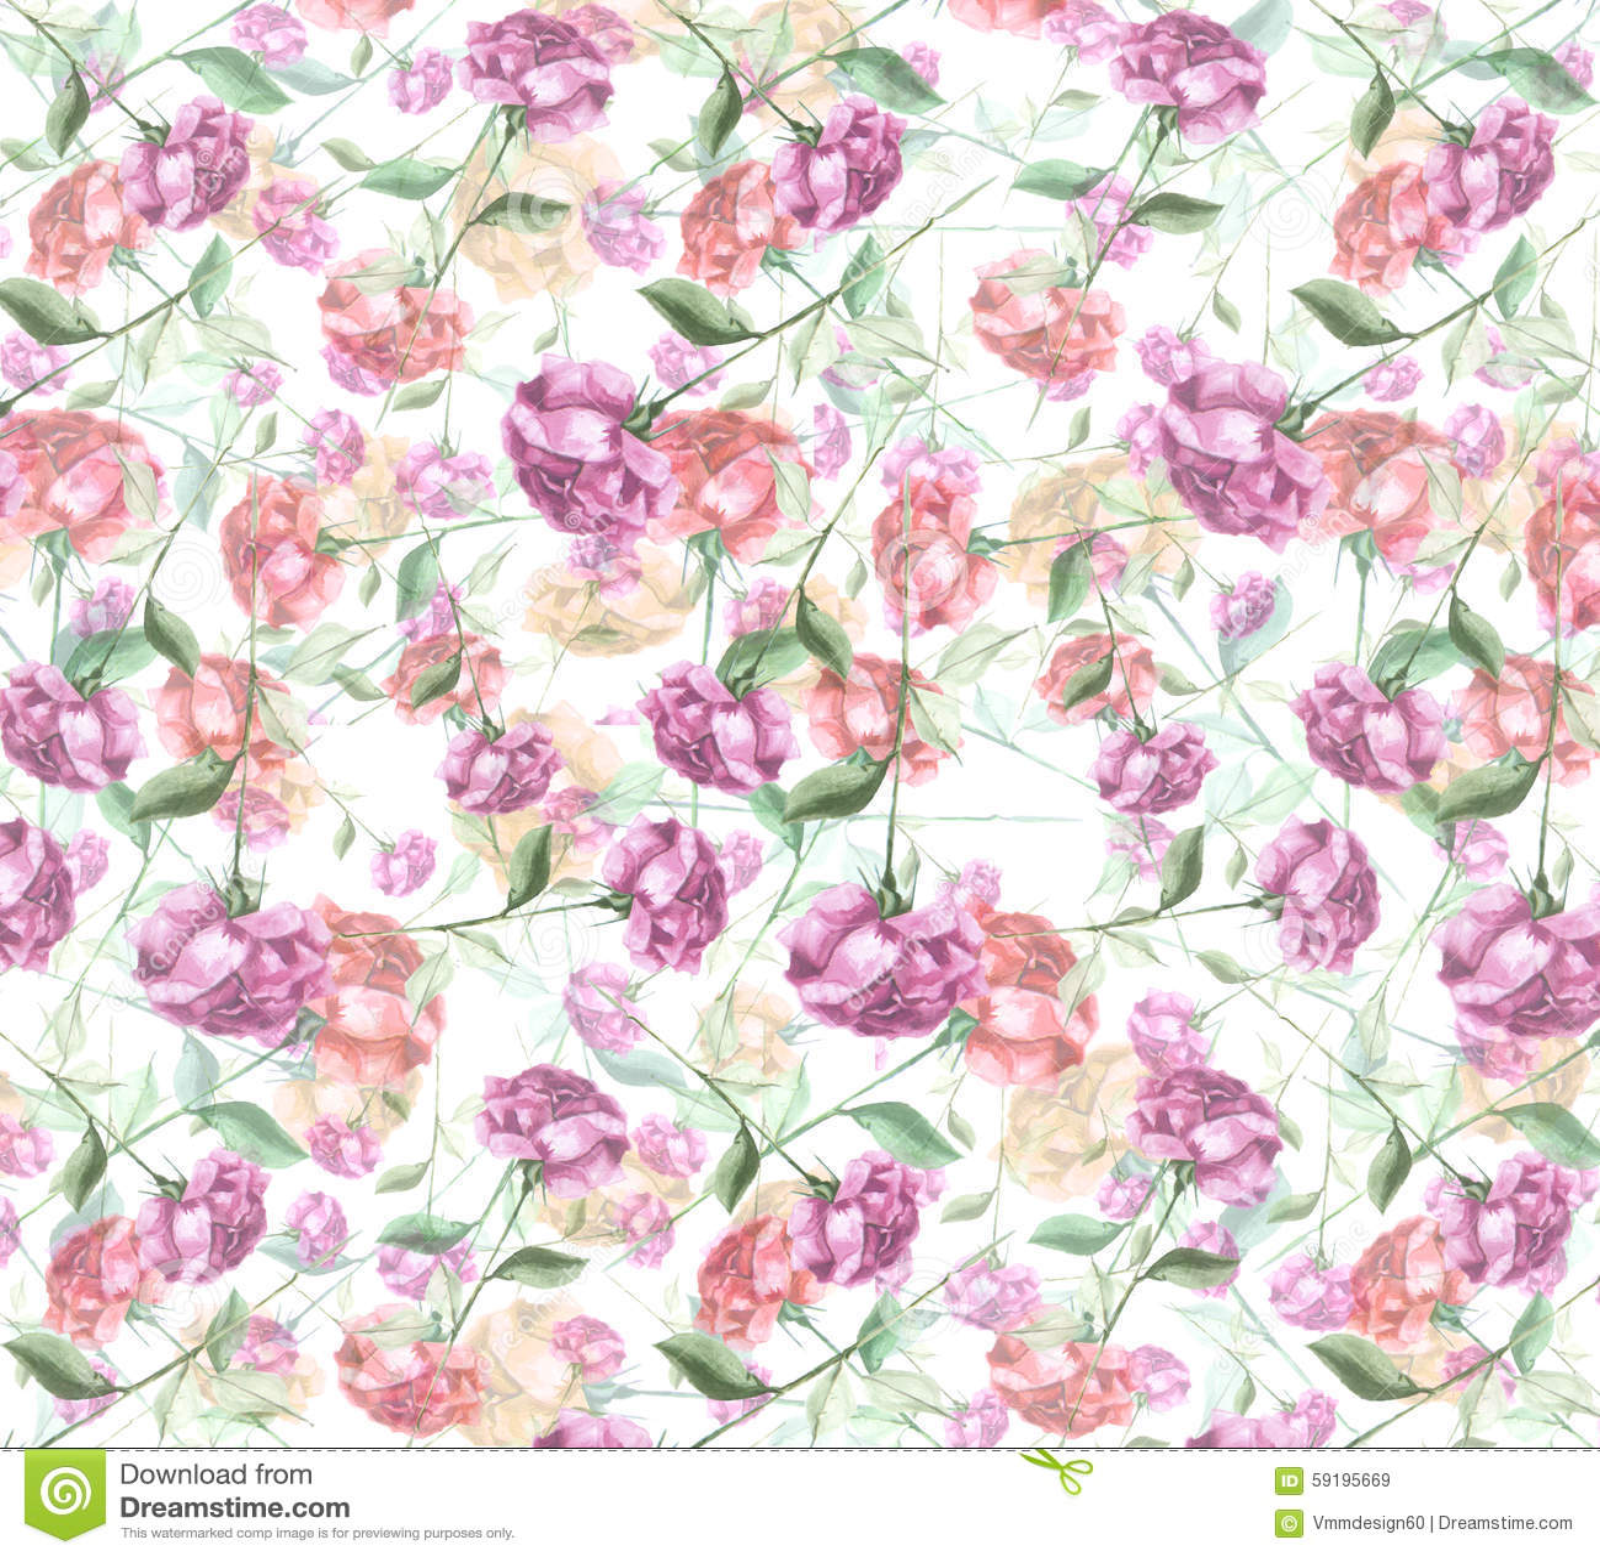 Watercolor Layered Rose Flower Art Seamless Wallpaper Background